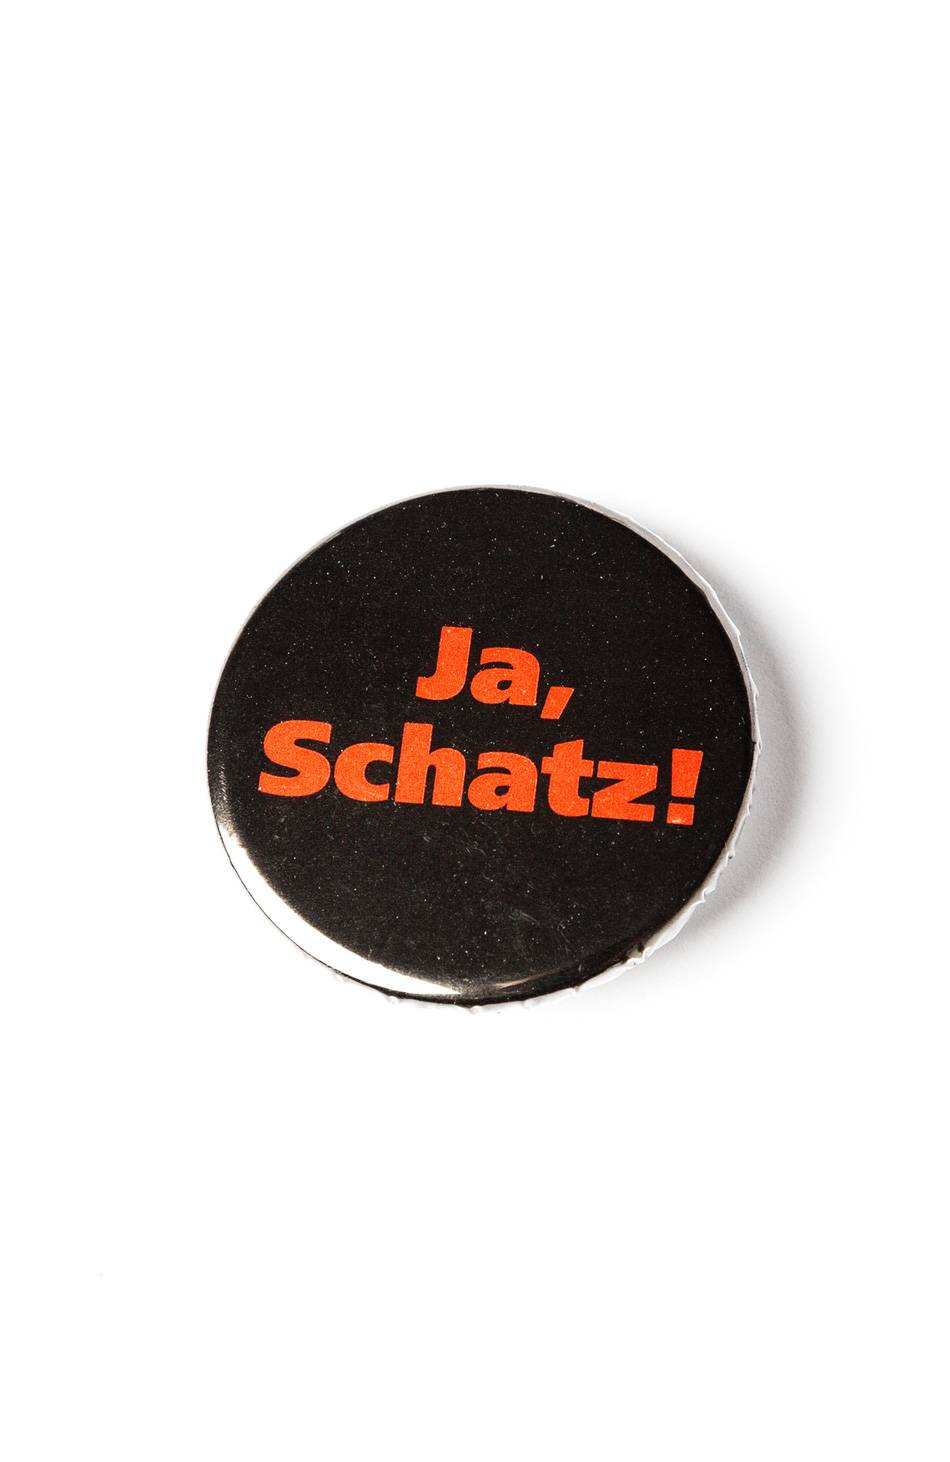 Reimkultur Ja, Schatz!